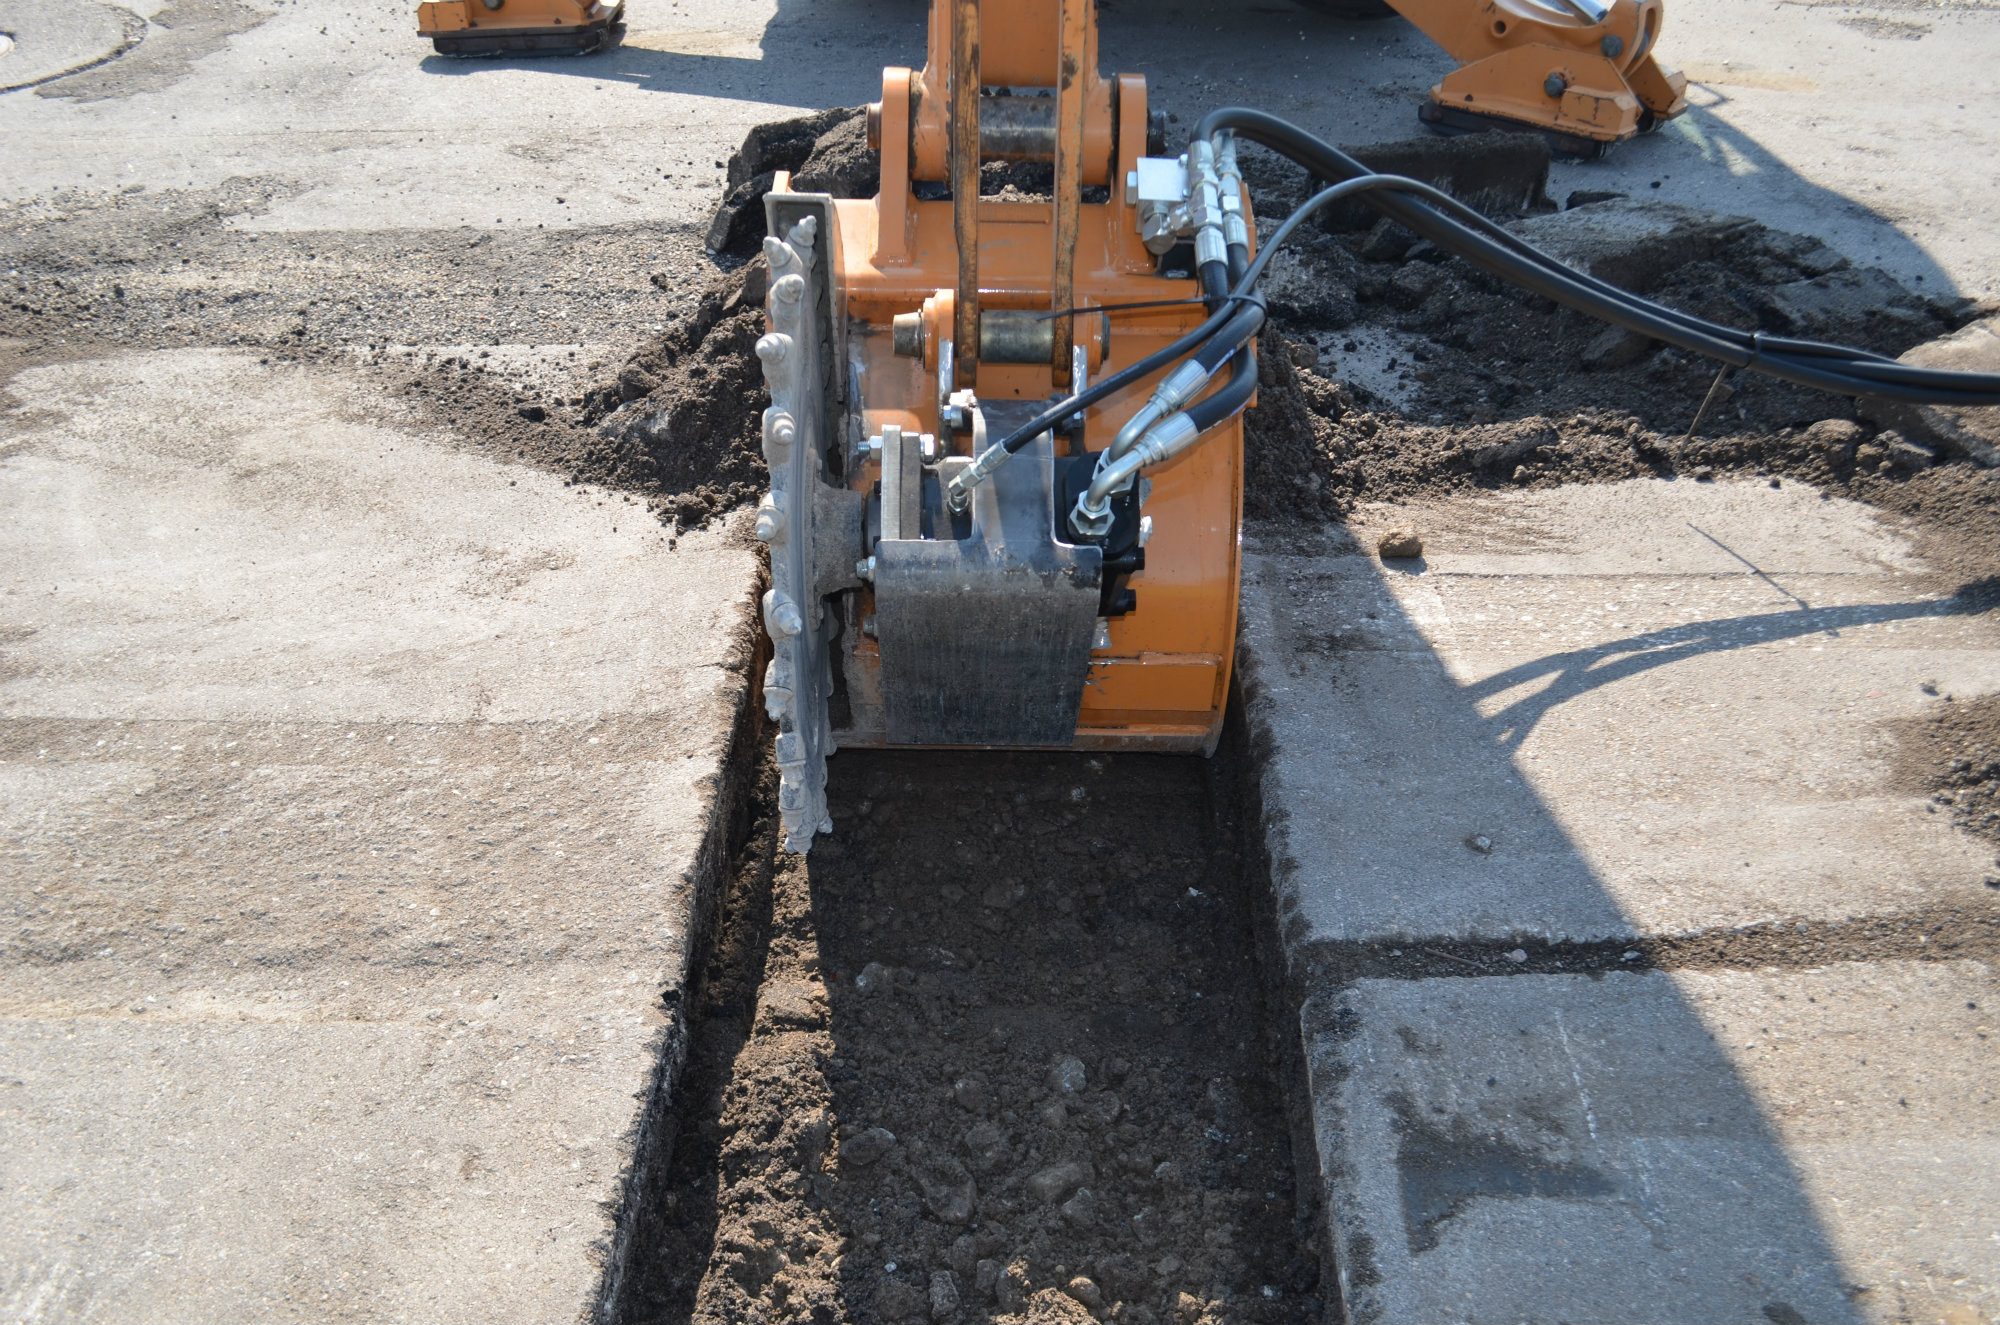 Scb 600 Slot Cutter Bucket Concrete Construction Magazine